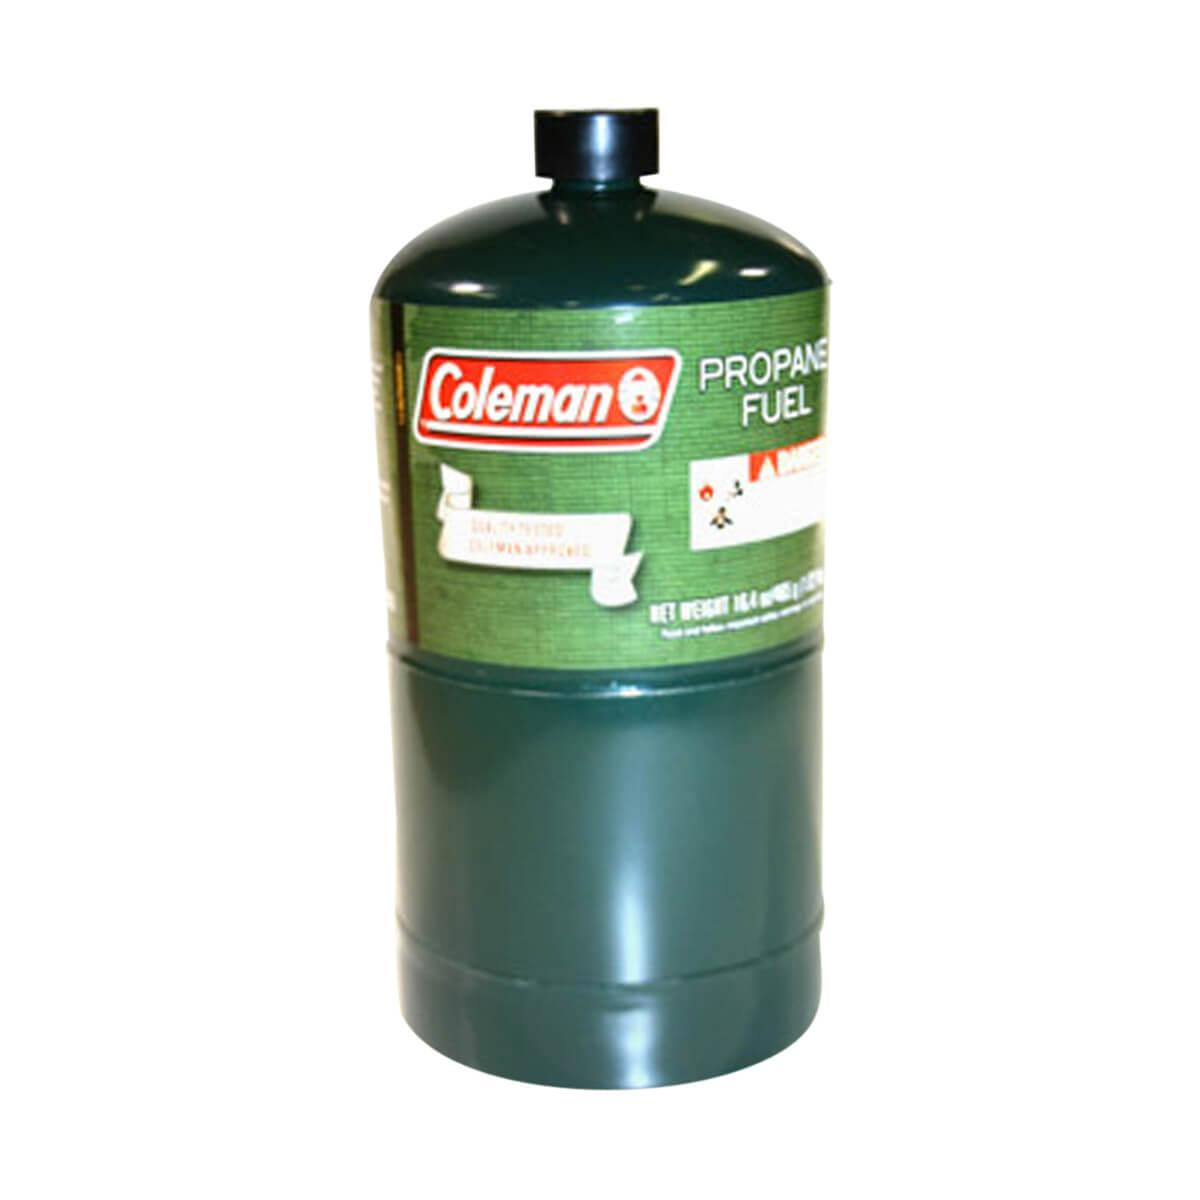 Propane Cylinder - 16.4 oz